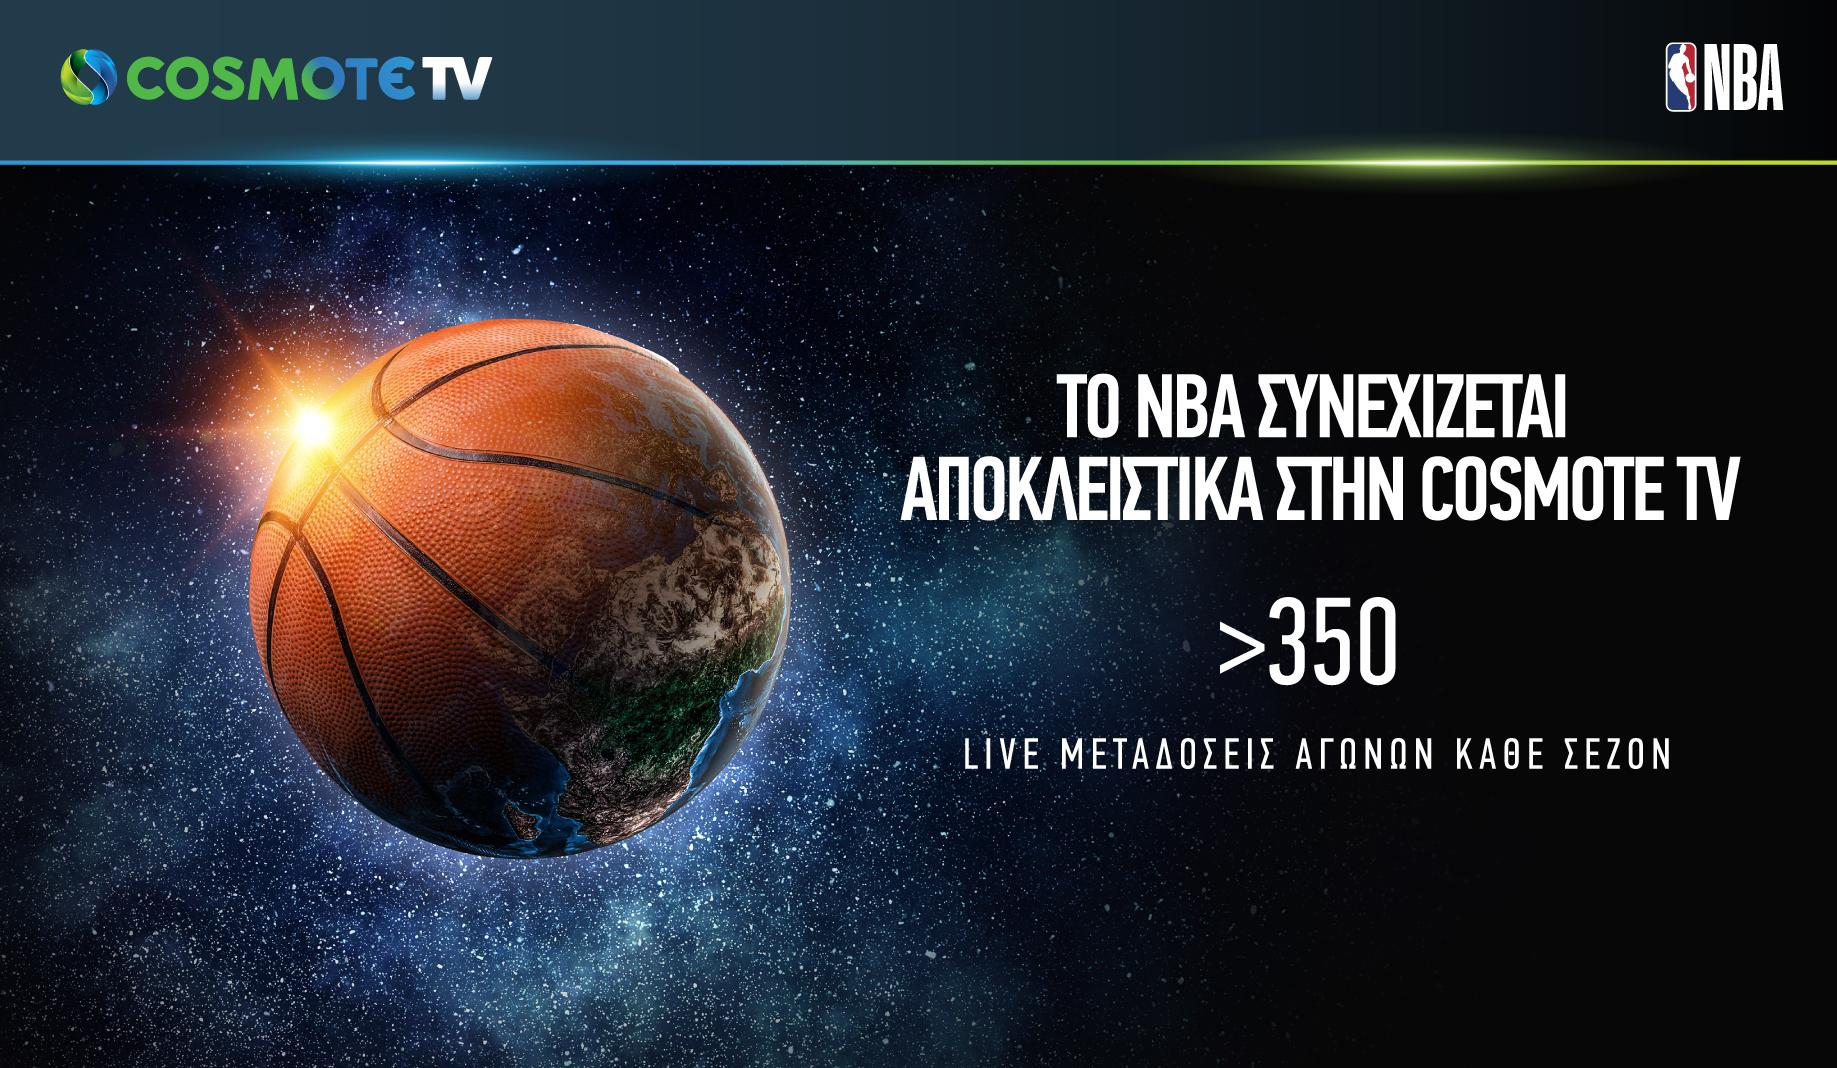 COSMOTE TV NBA 2021